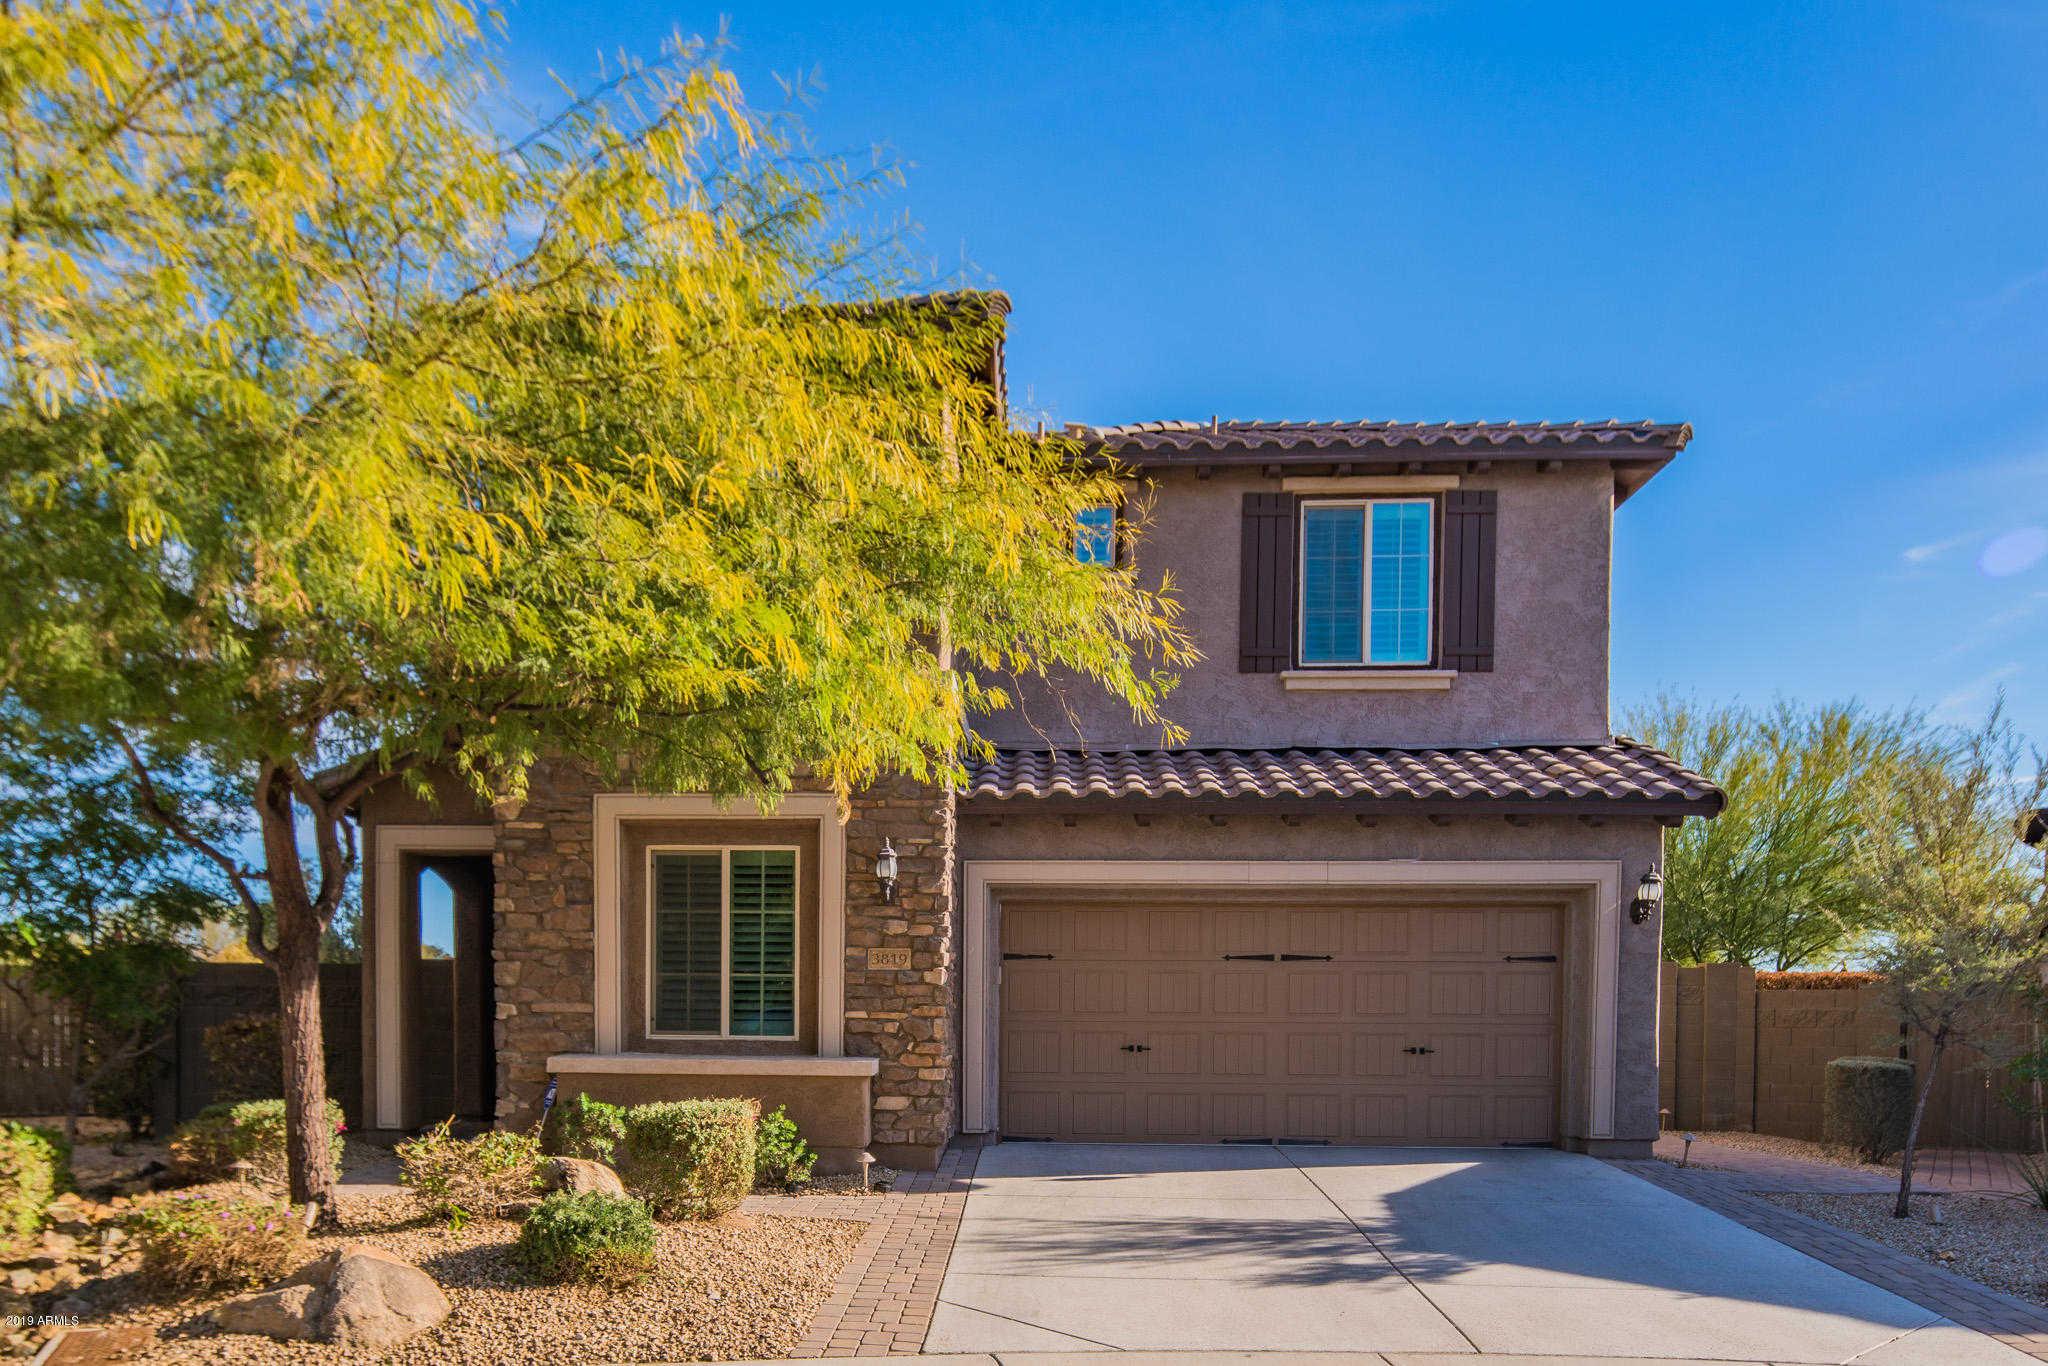 $665,000 - 5Br/5Ba - Home for Sale in Desert Ridge Superblock 11 Parcel 4, Phoenix